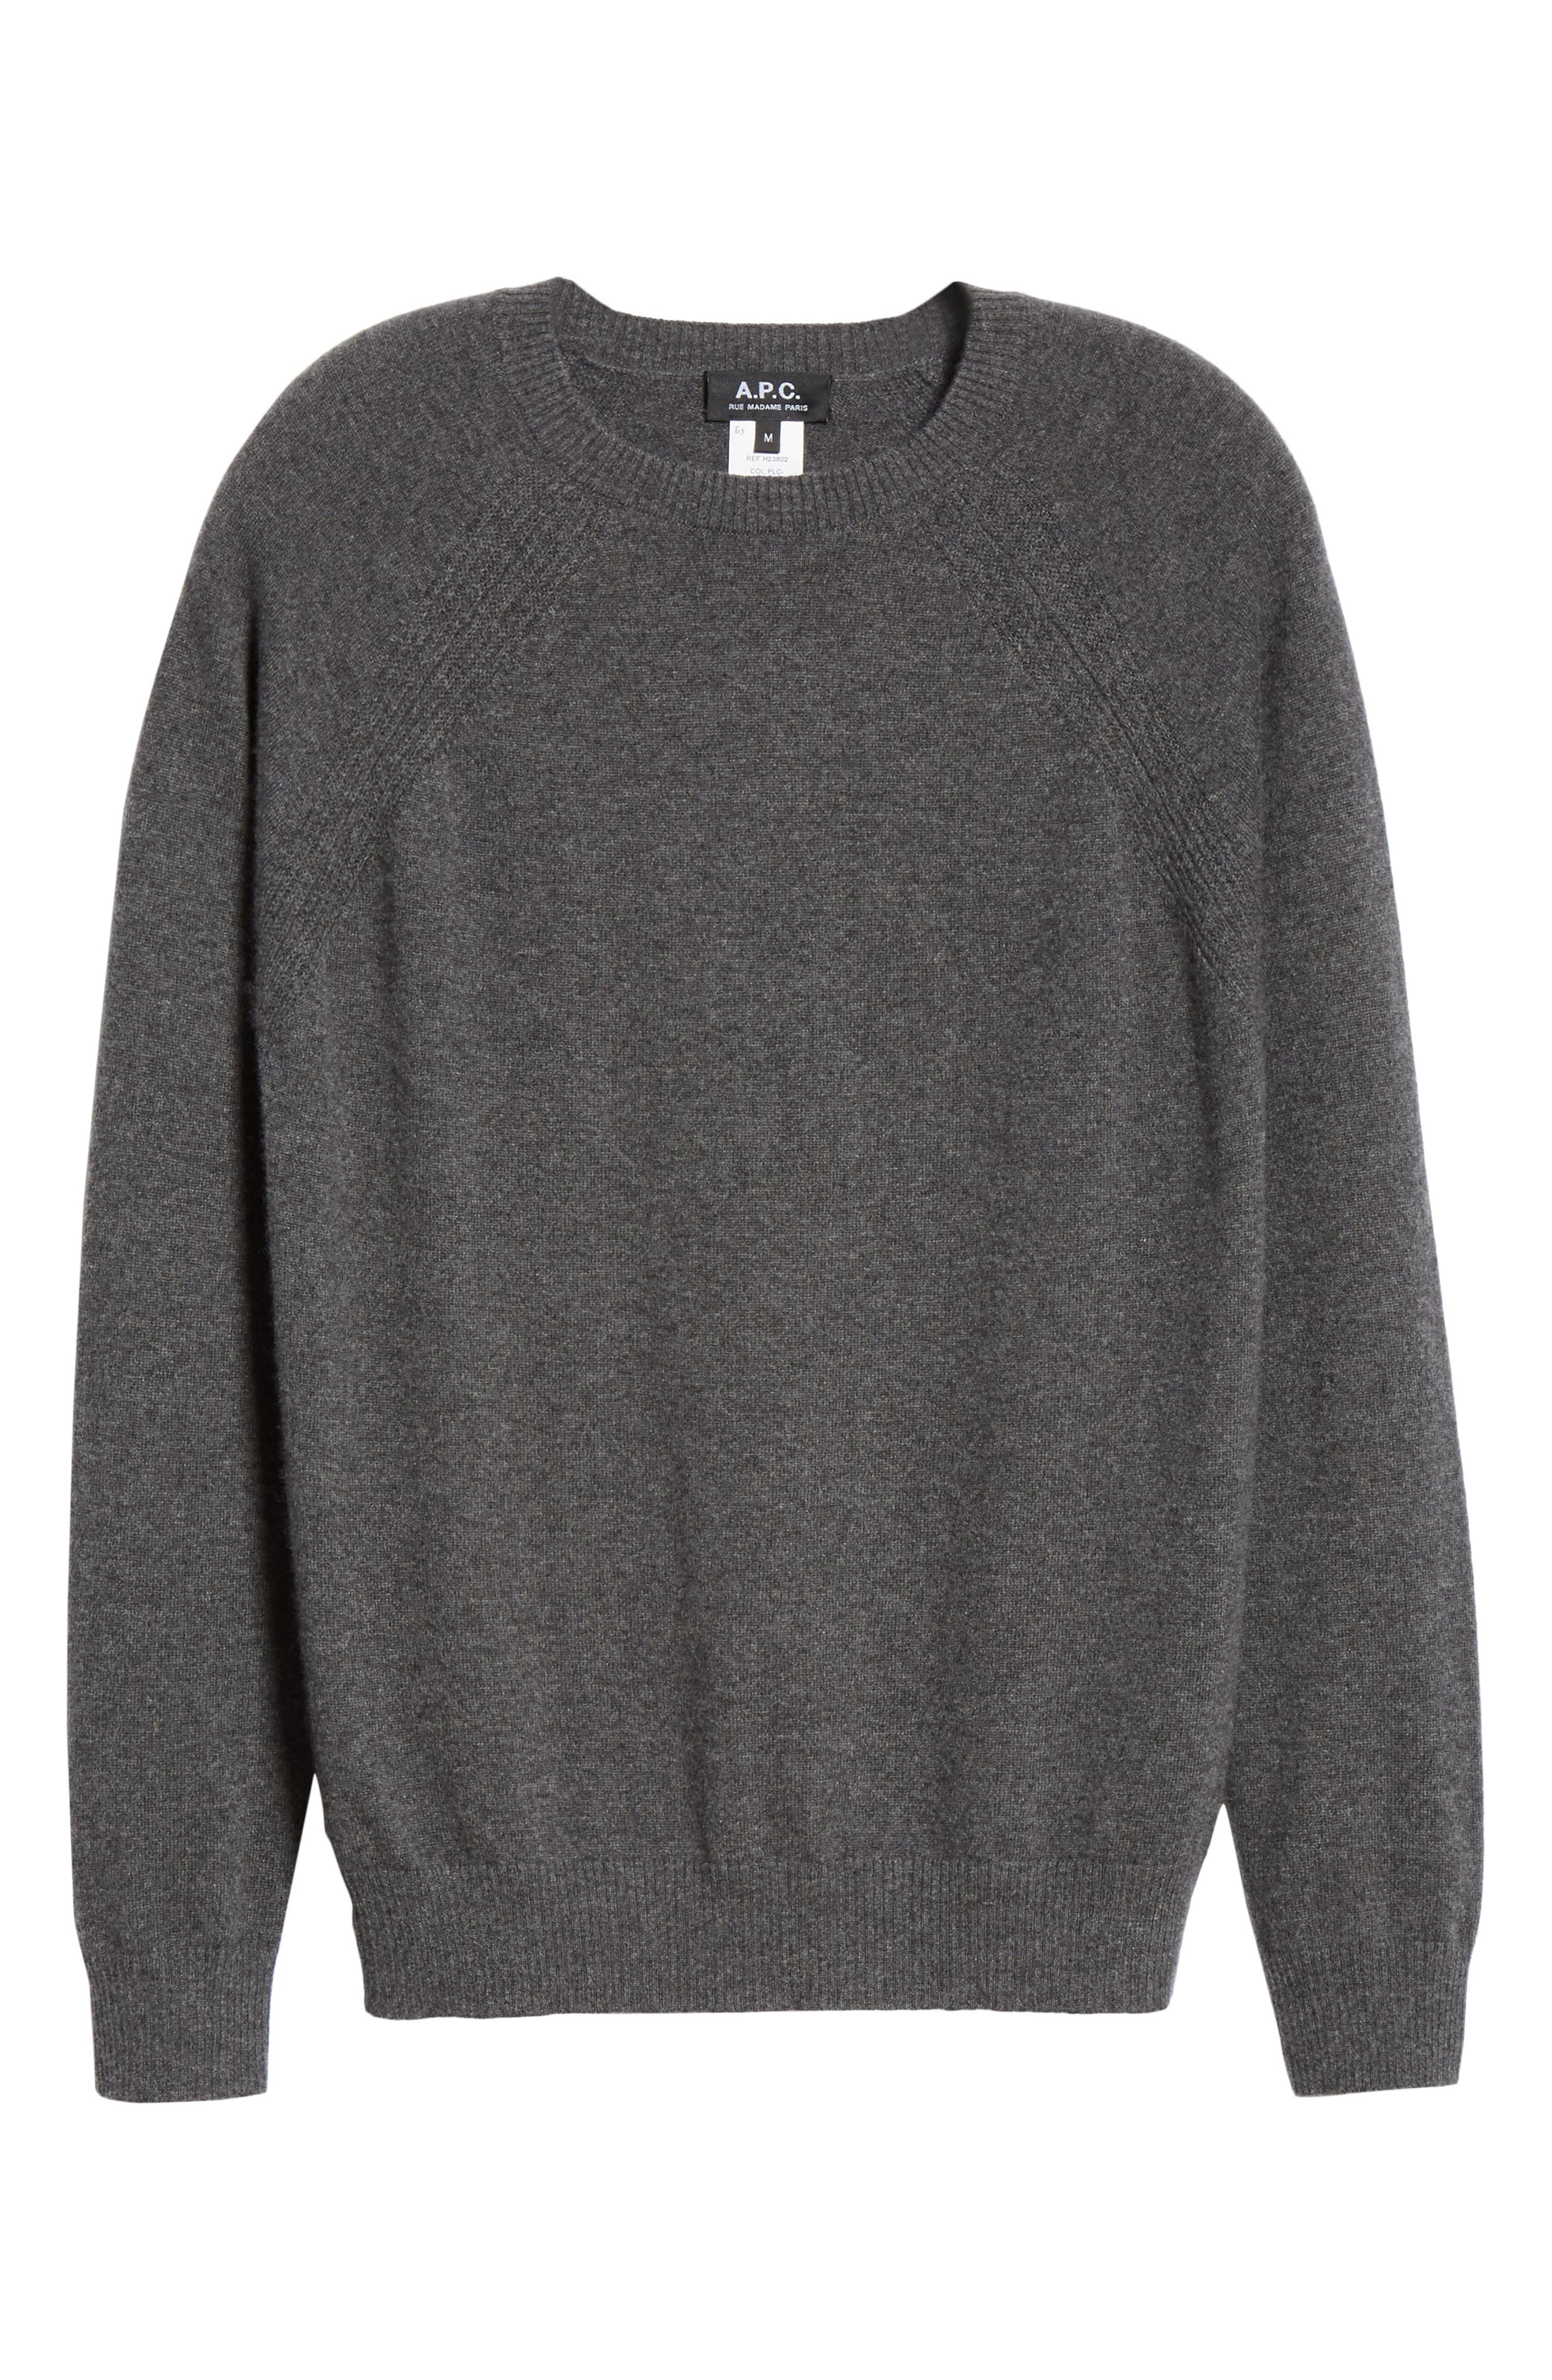 Cashmere Crewneck Sweater,                             Alternate thumbnail 6, color,                             ANTHRACITE